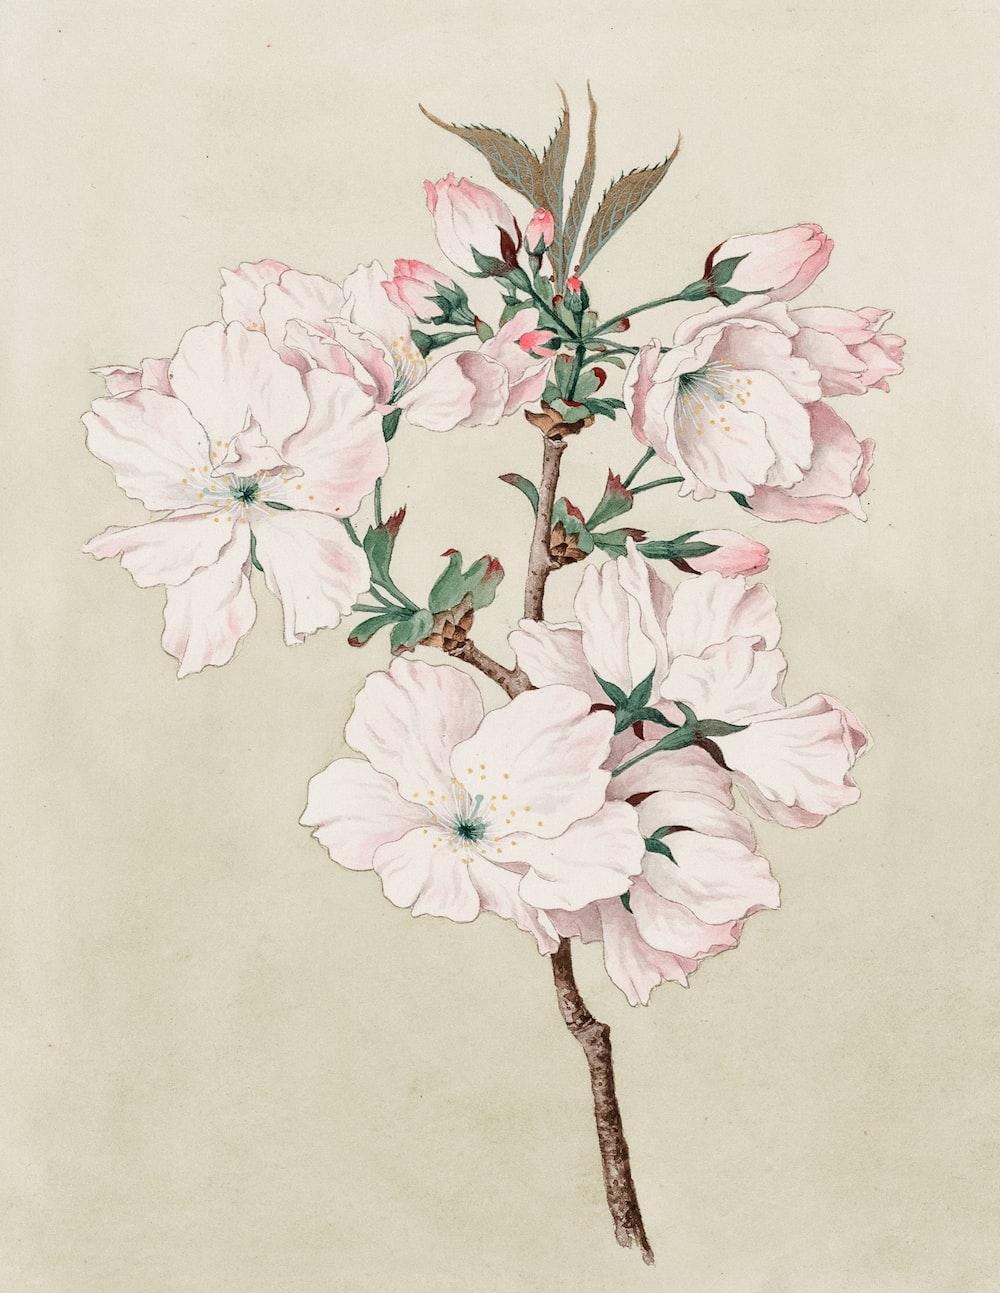 Watercolor of ariaki (daybreak) cherry blossoms.